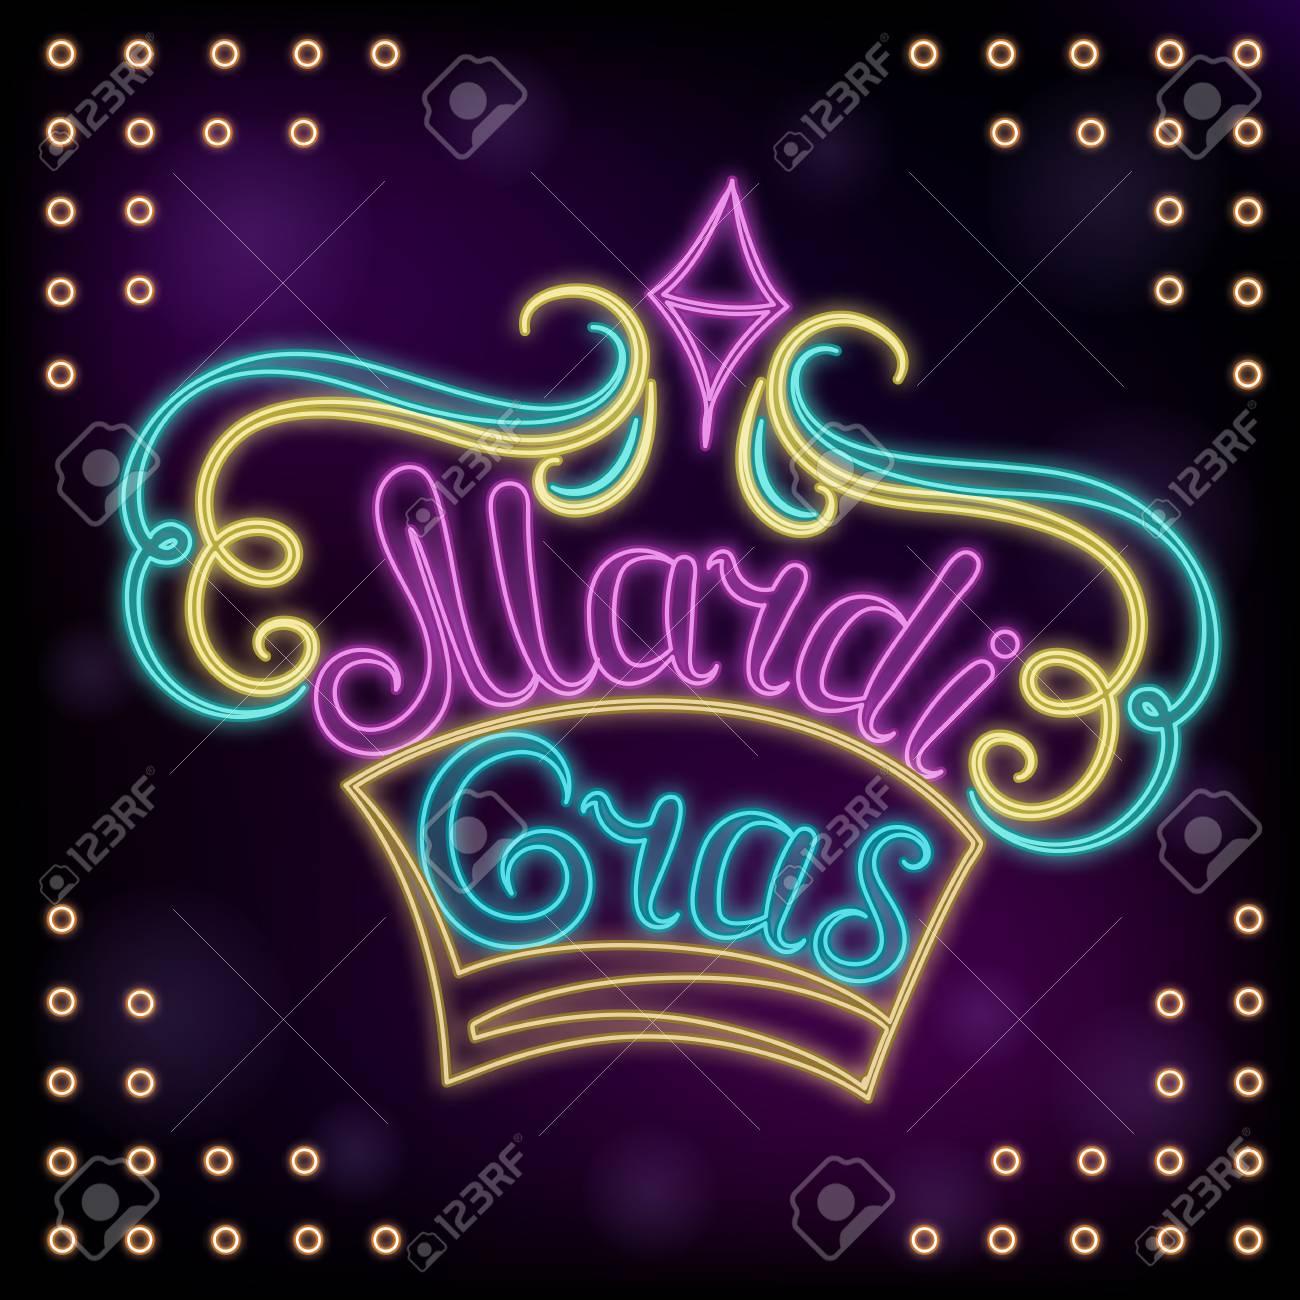 Mardi Gras Hand Lettering Decor For The New Orleans Festival